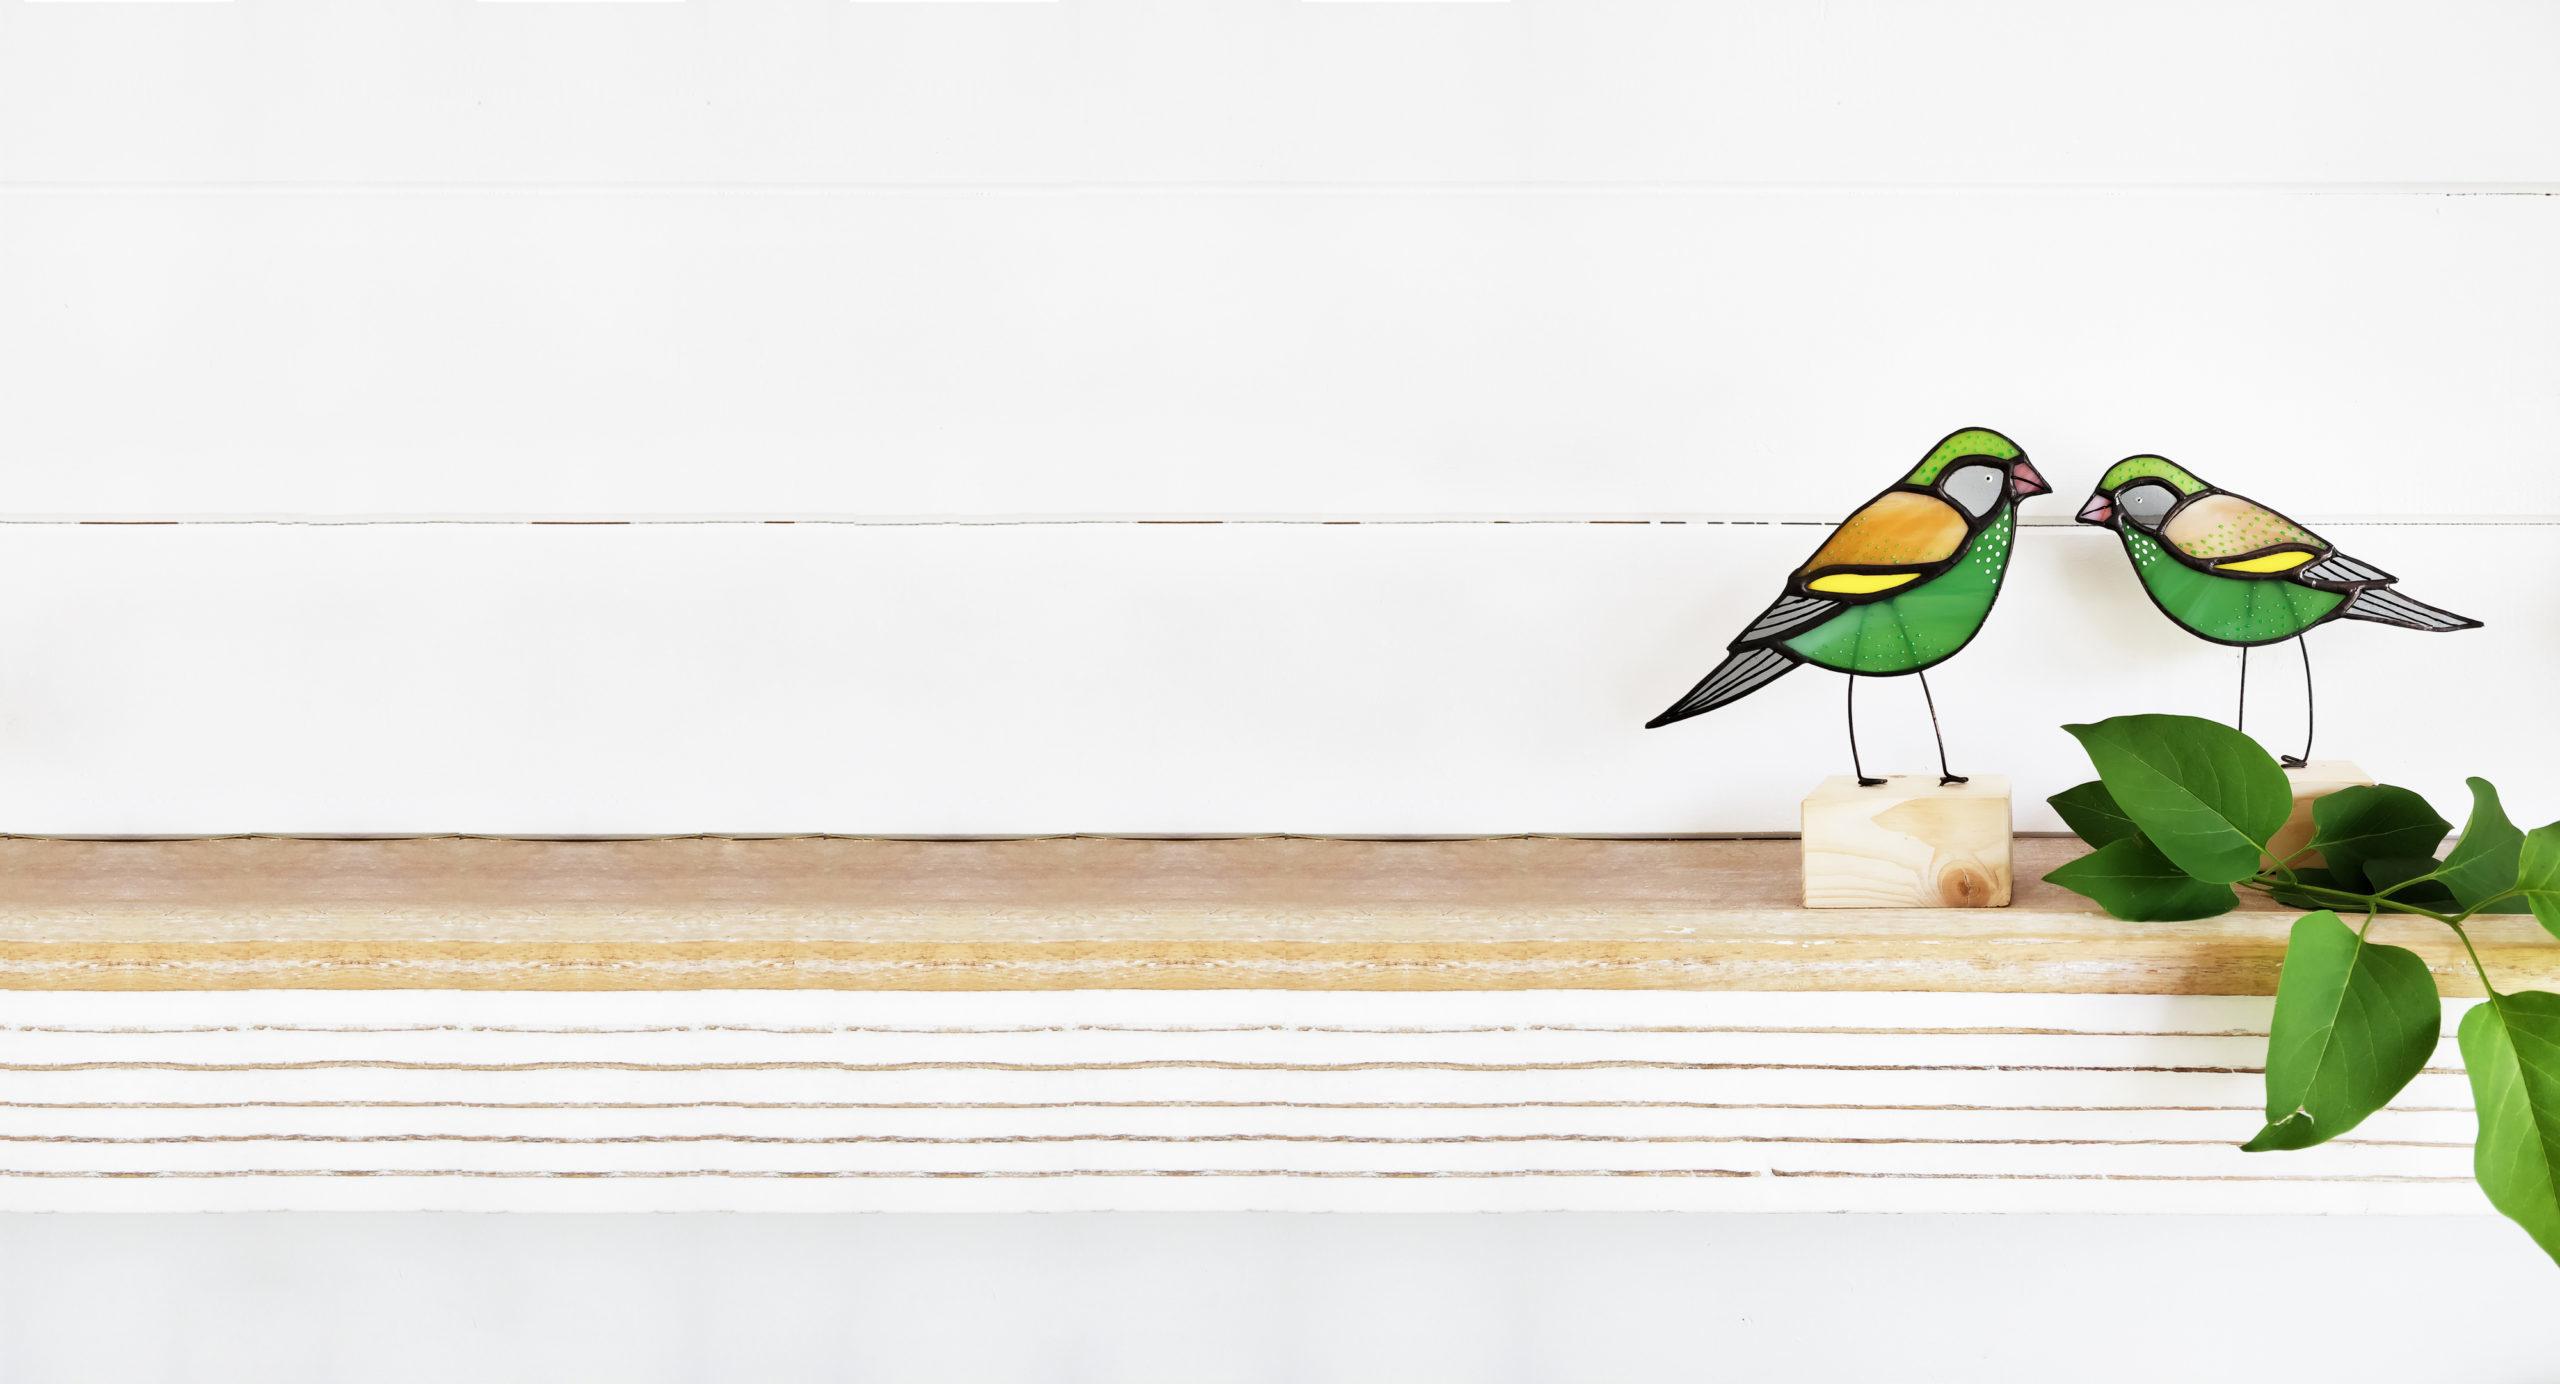 Greenfinch Glass Birds by Jenny Newall Glass, Pedddle